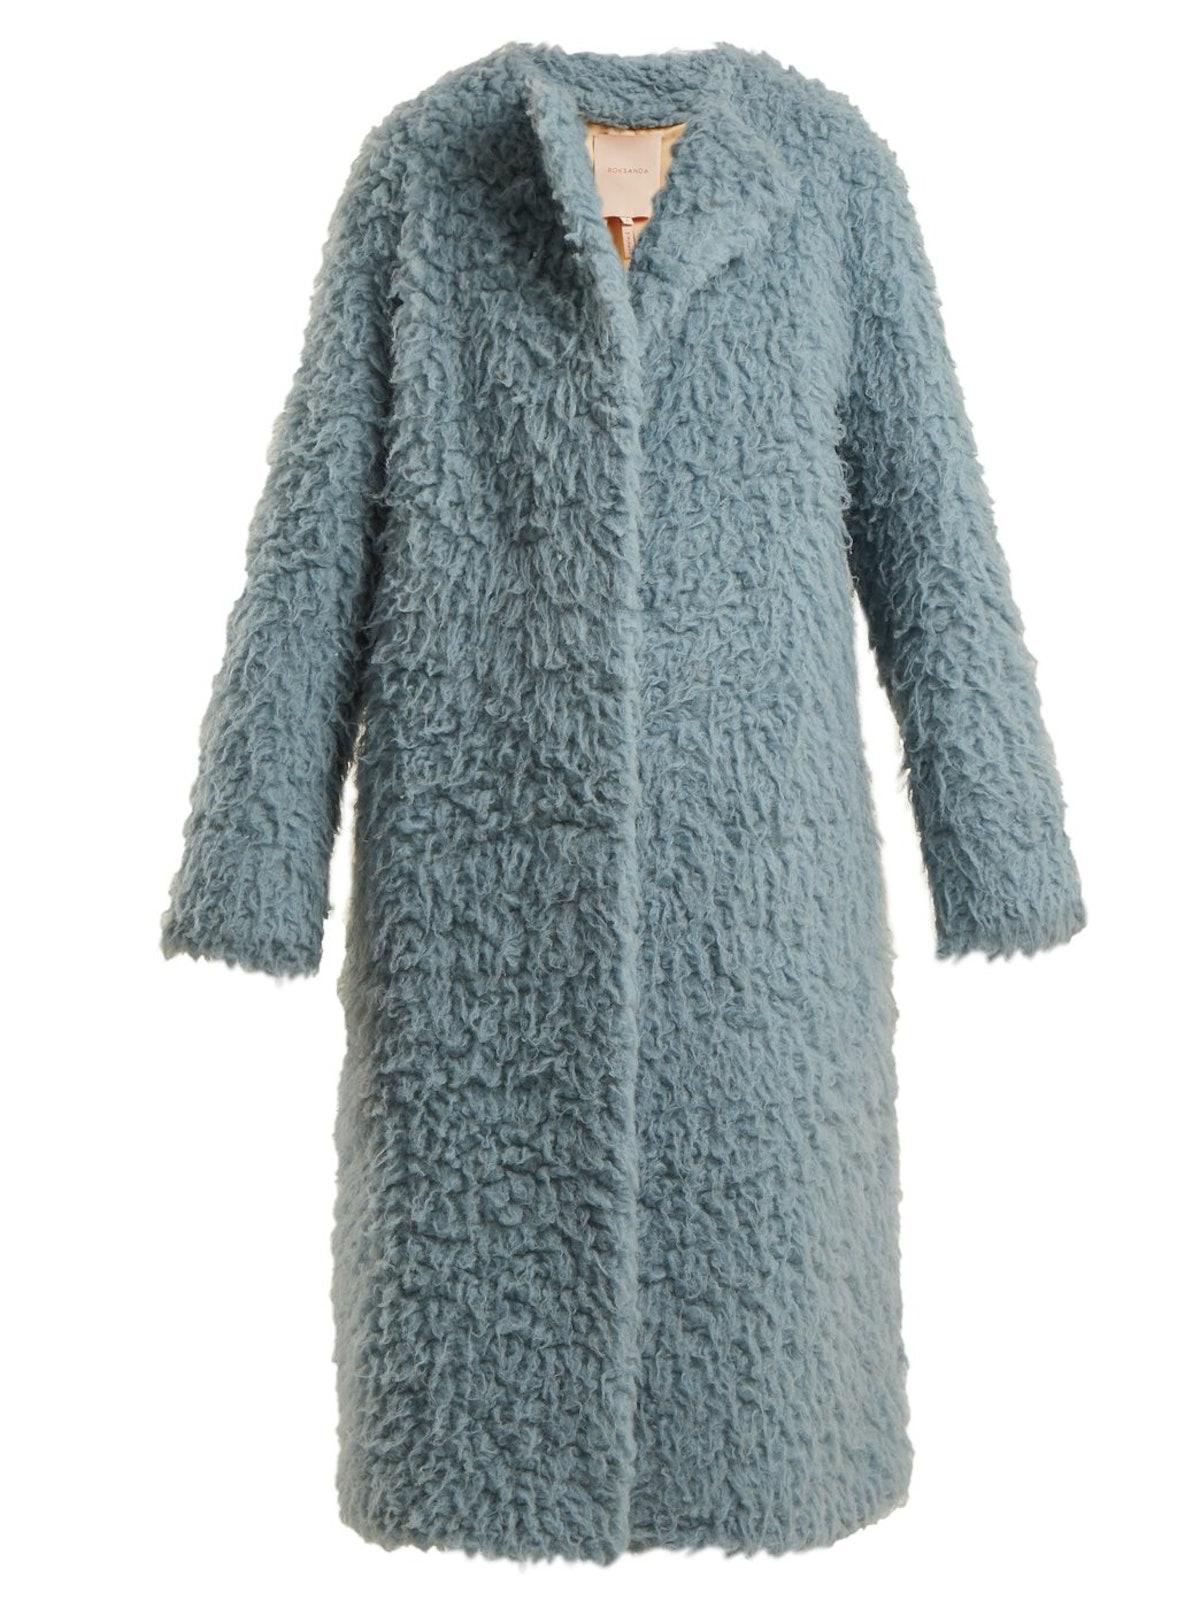 Textured Camel Hair Coat